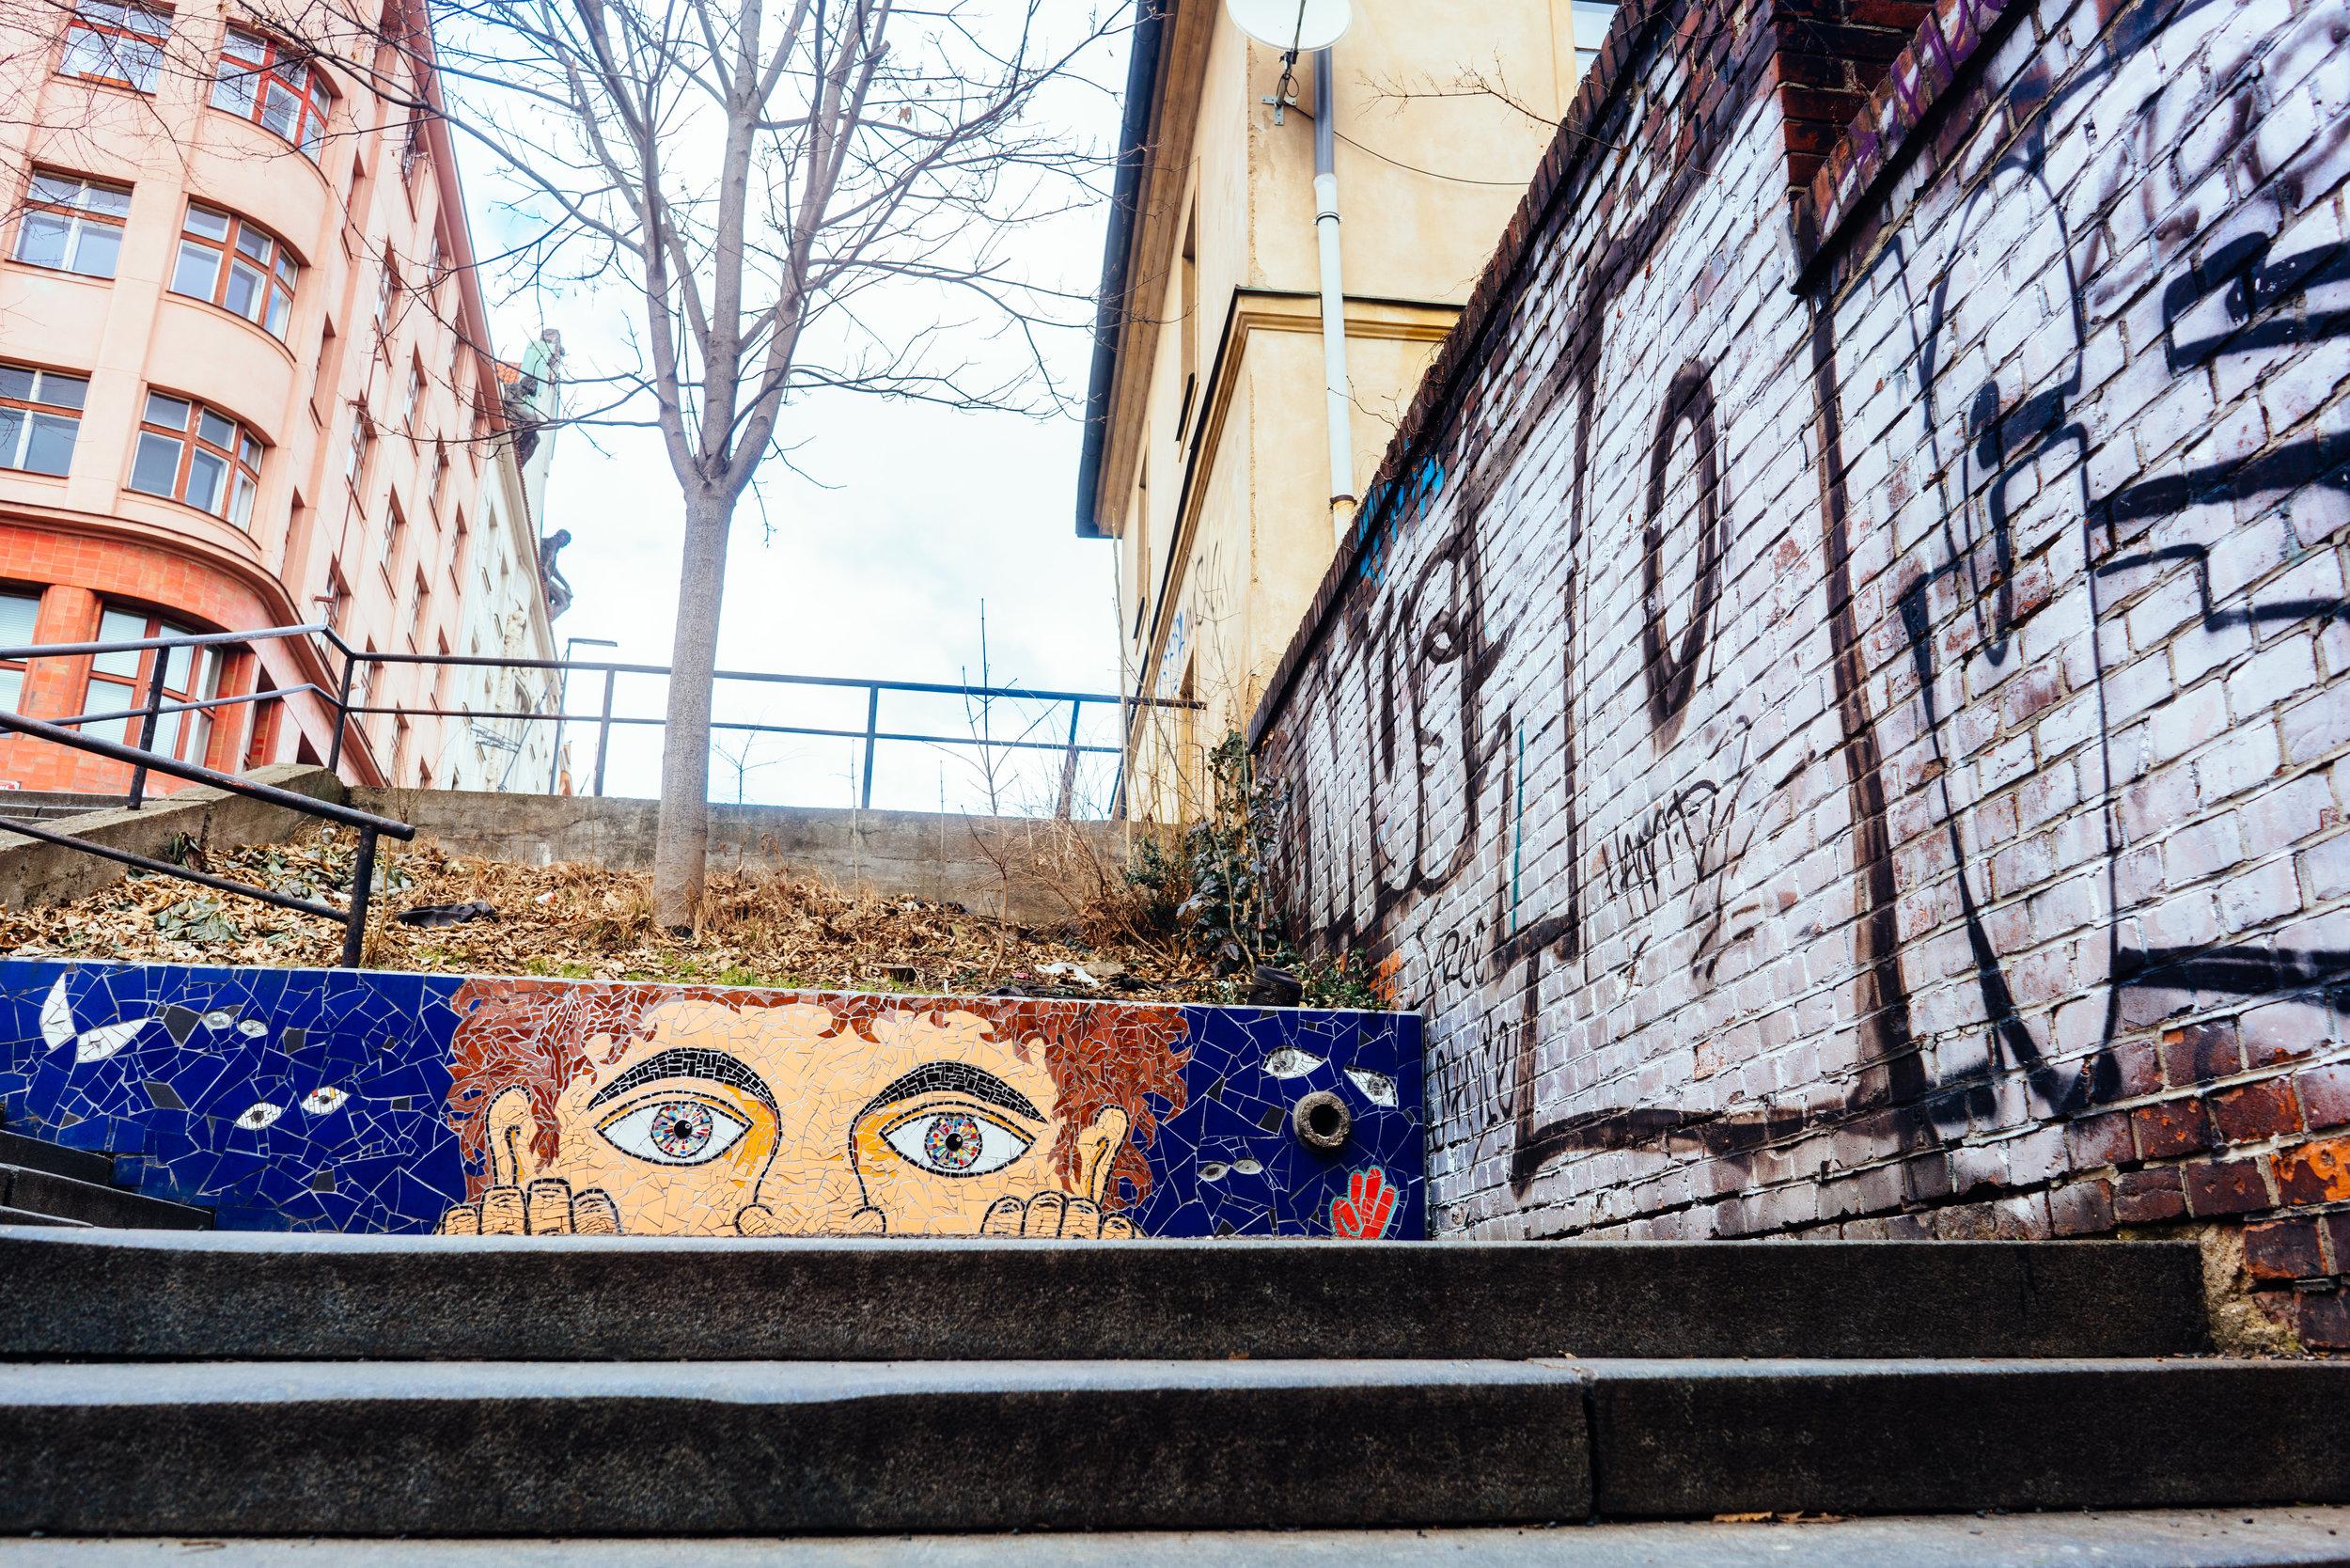 Street art & graffiti in Prague